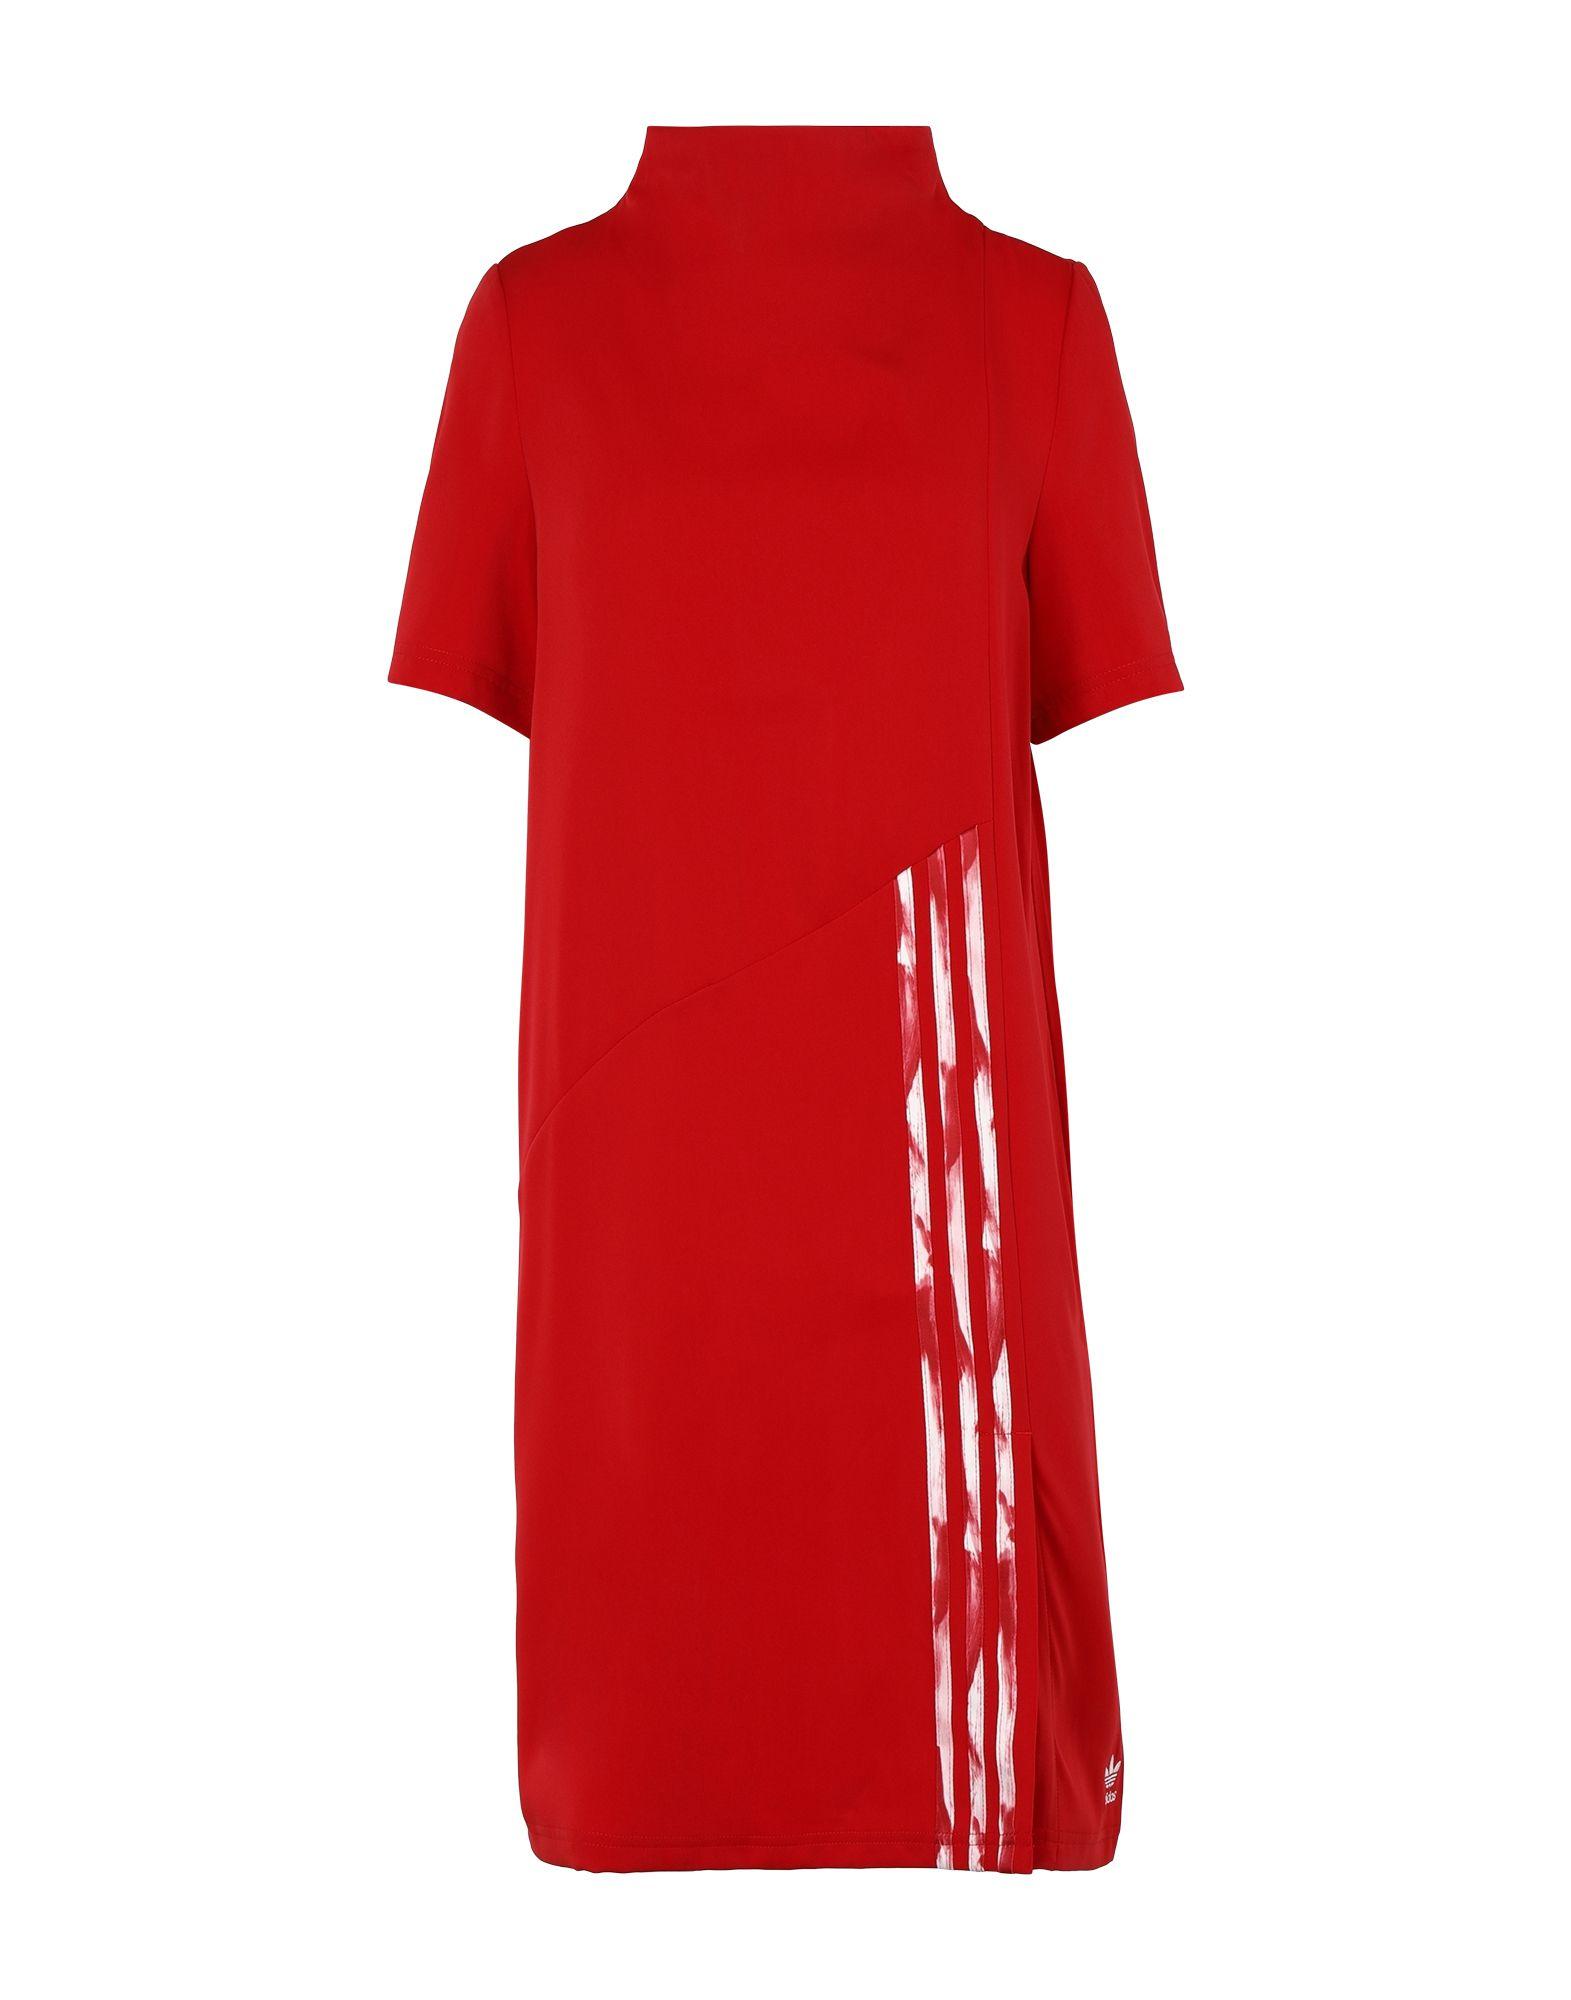 ADIDAS ORIGINALS by DANIËLLE CATHARI Платье до колена adidas originals by daniëlle cathari топ без рукавов